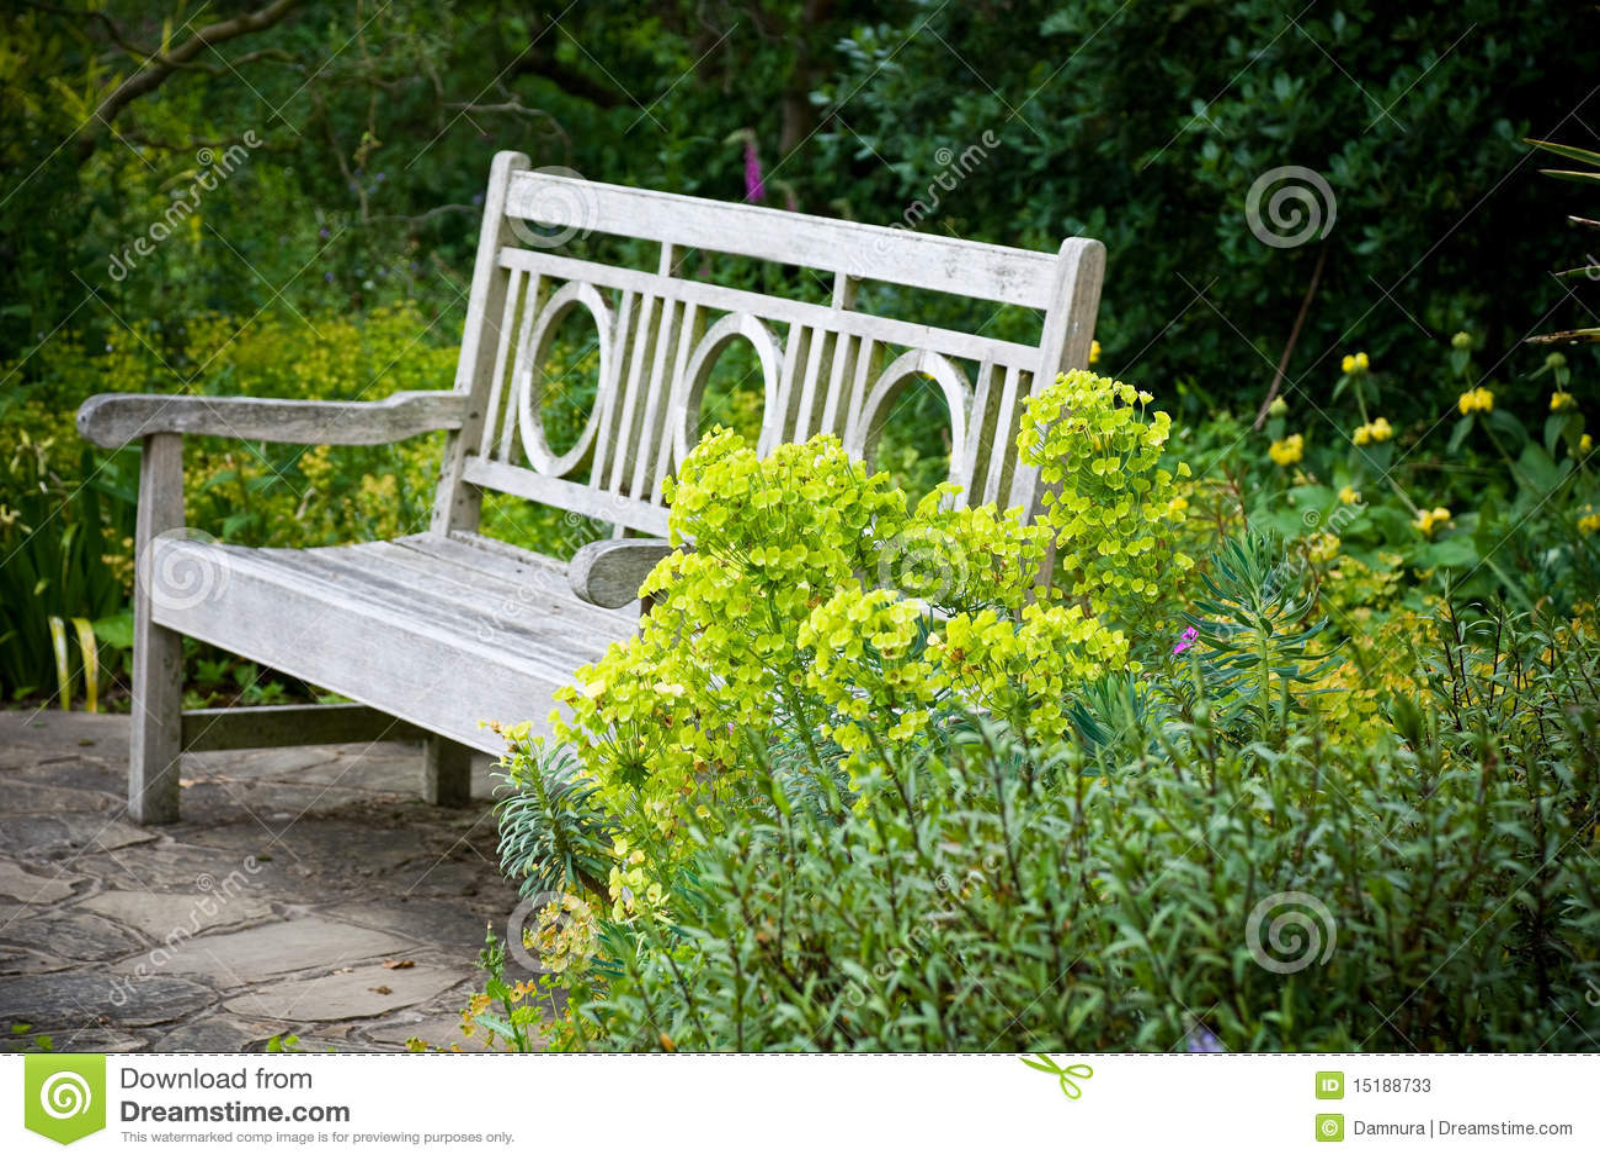 fotos jardim secreto:Secret Garden Benches